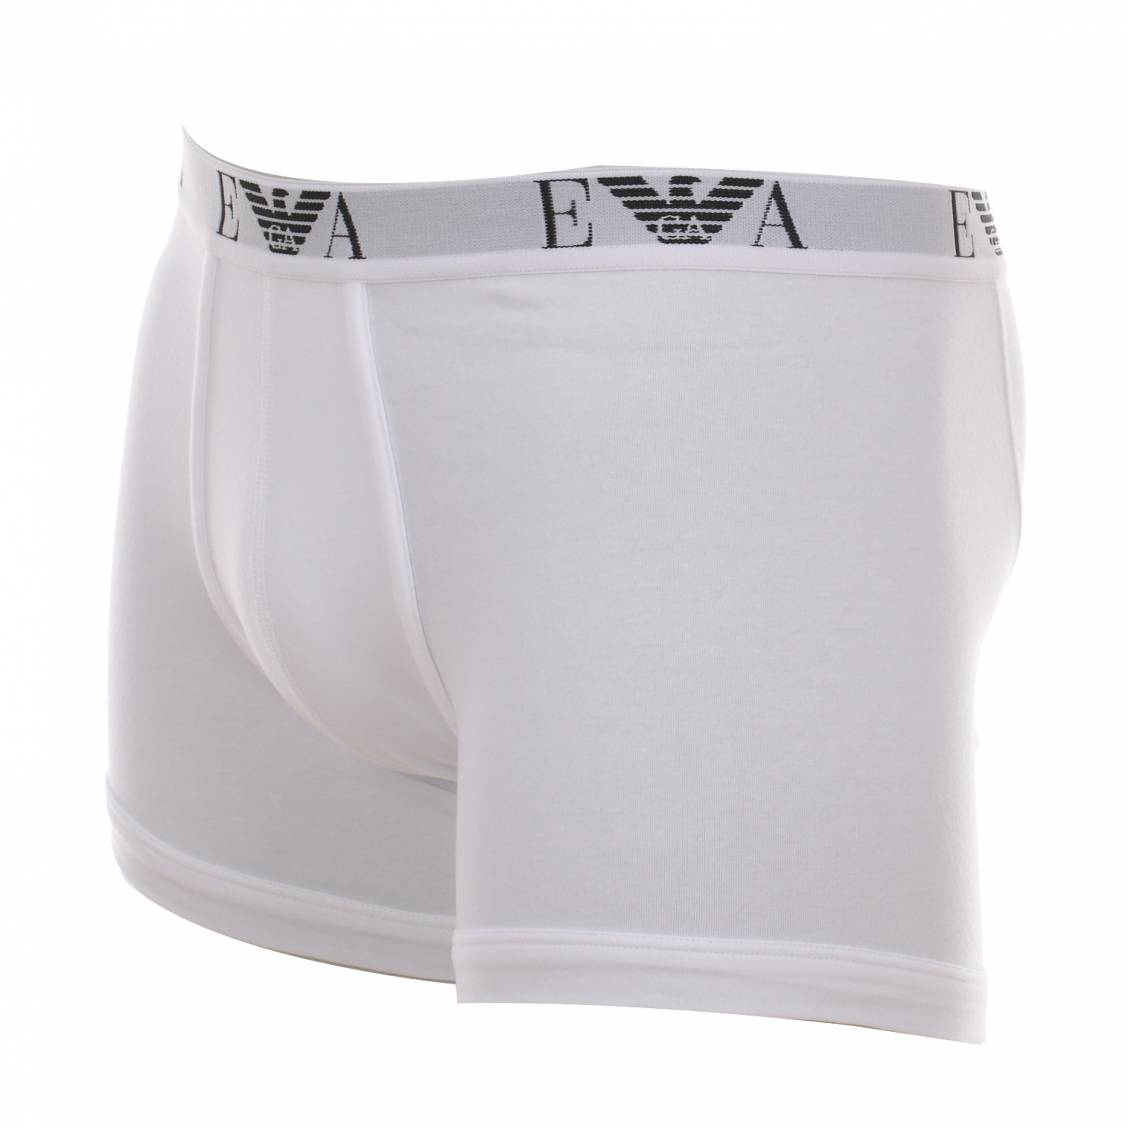 lot de boxers longs emporio armani blancs